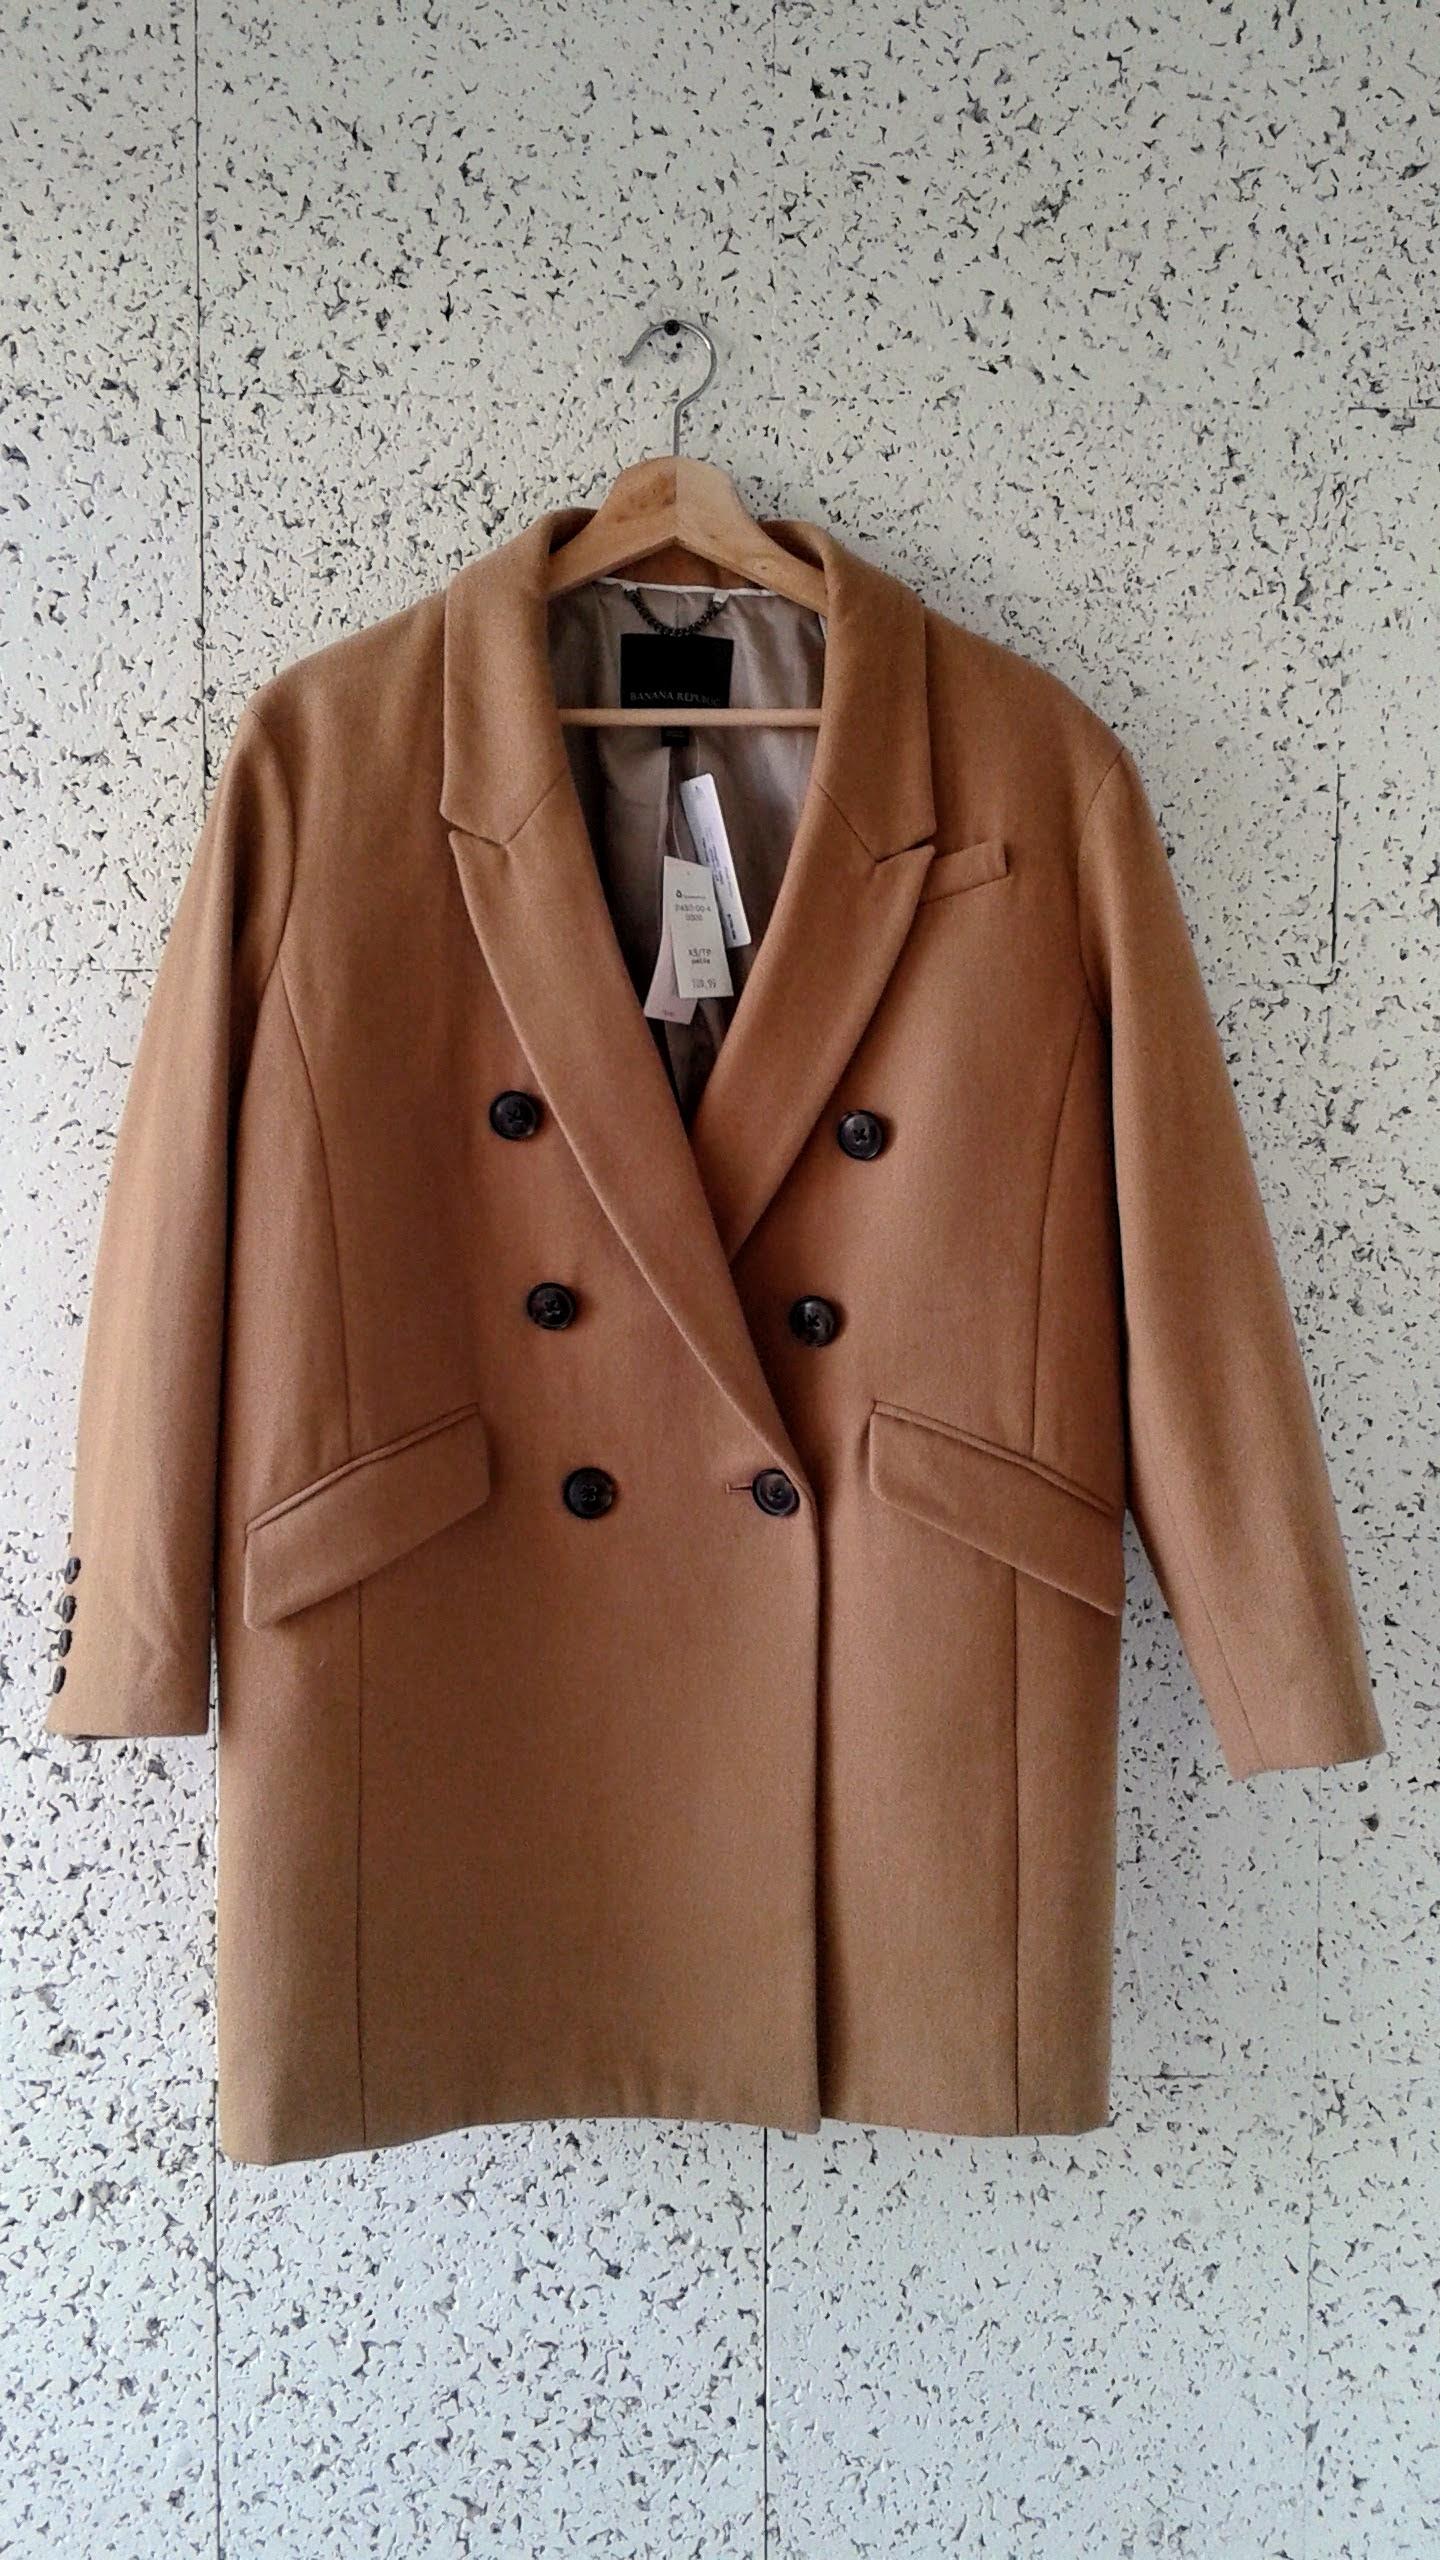 Banana Republic  coat (NWT); Size XS, $78